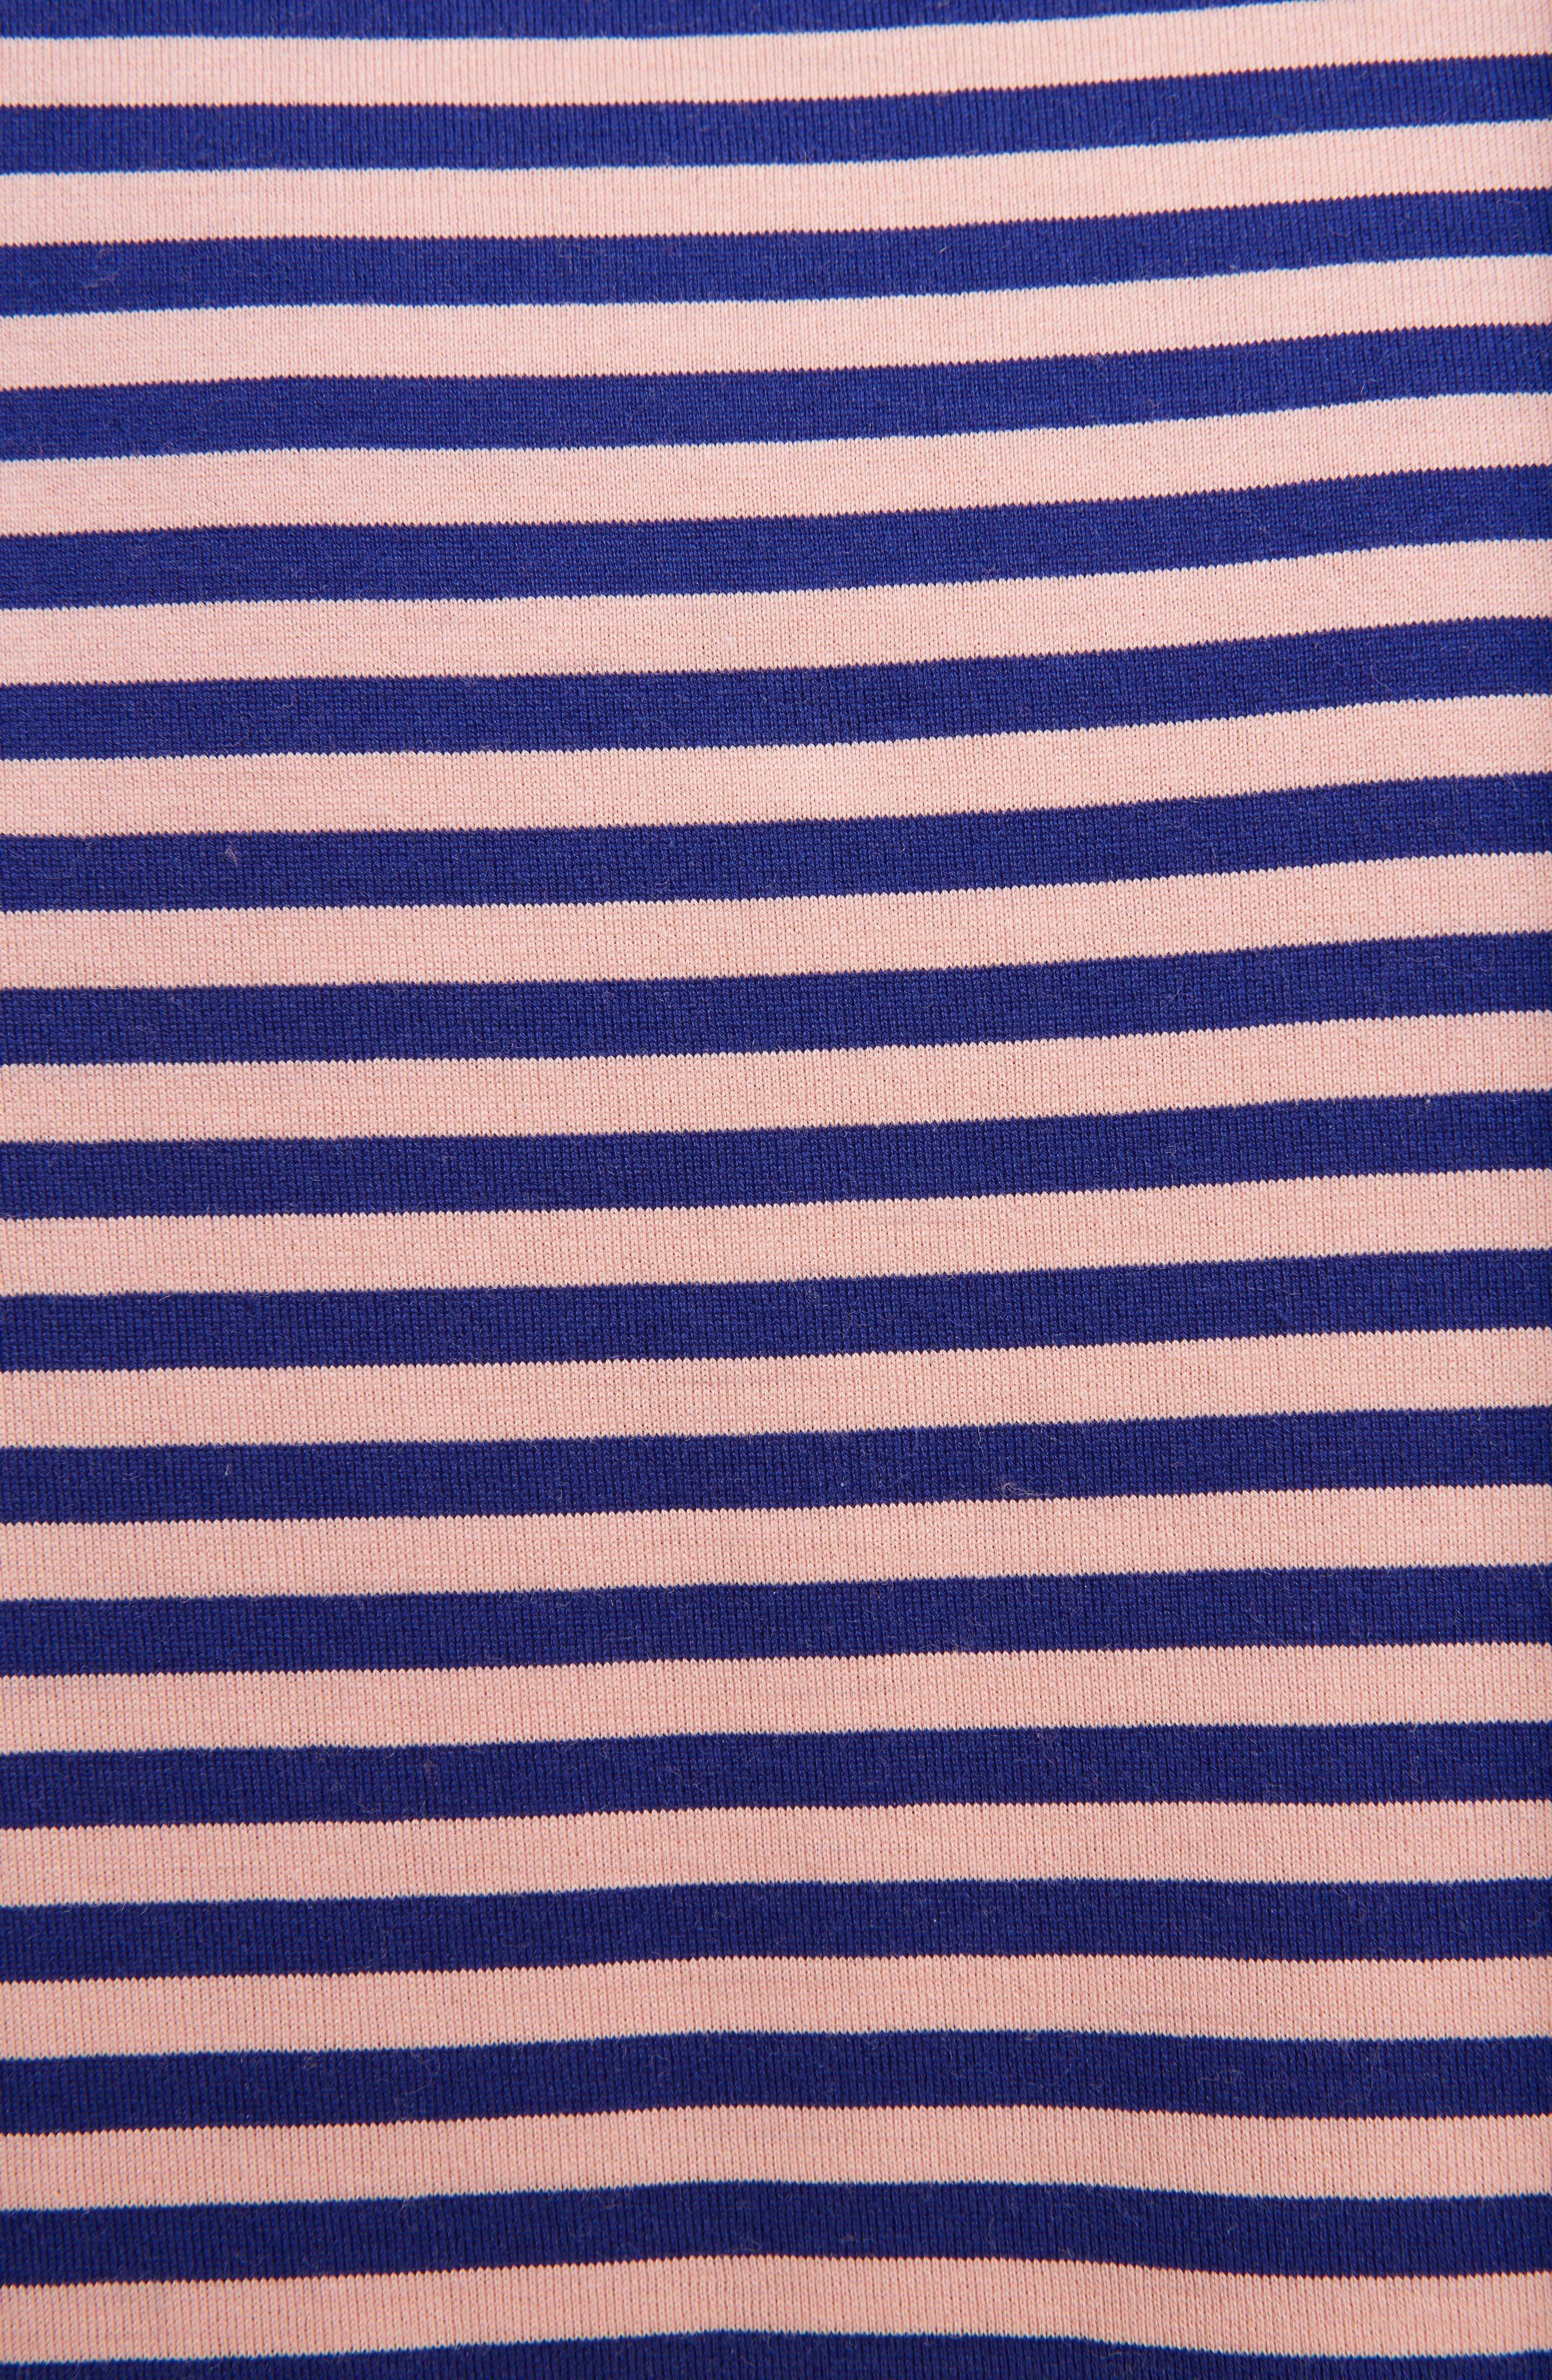 Napa Face Stripe Tee,                             Alternate thumbnail 3, color,                             Pale Pink/ Royal Blue